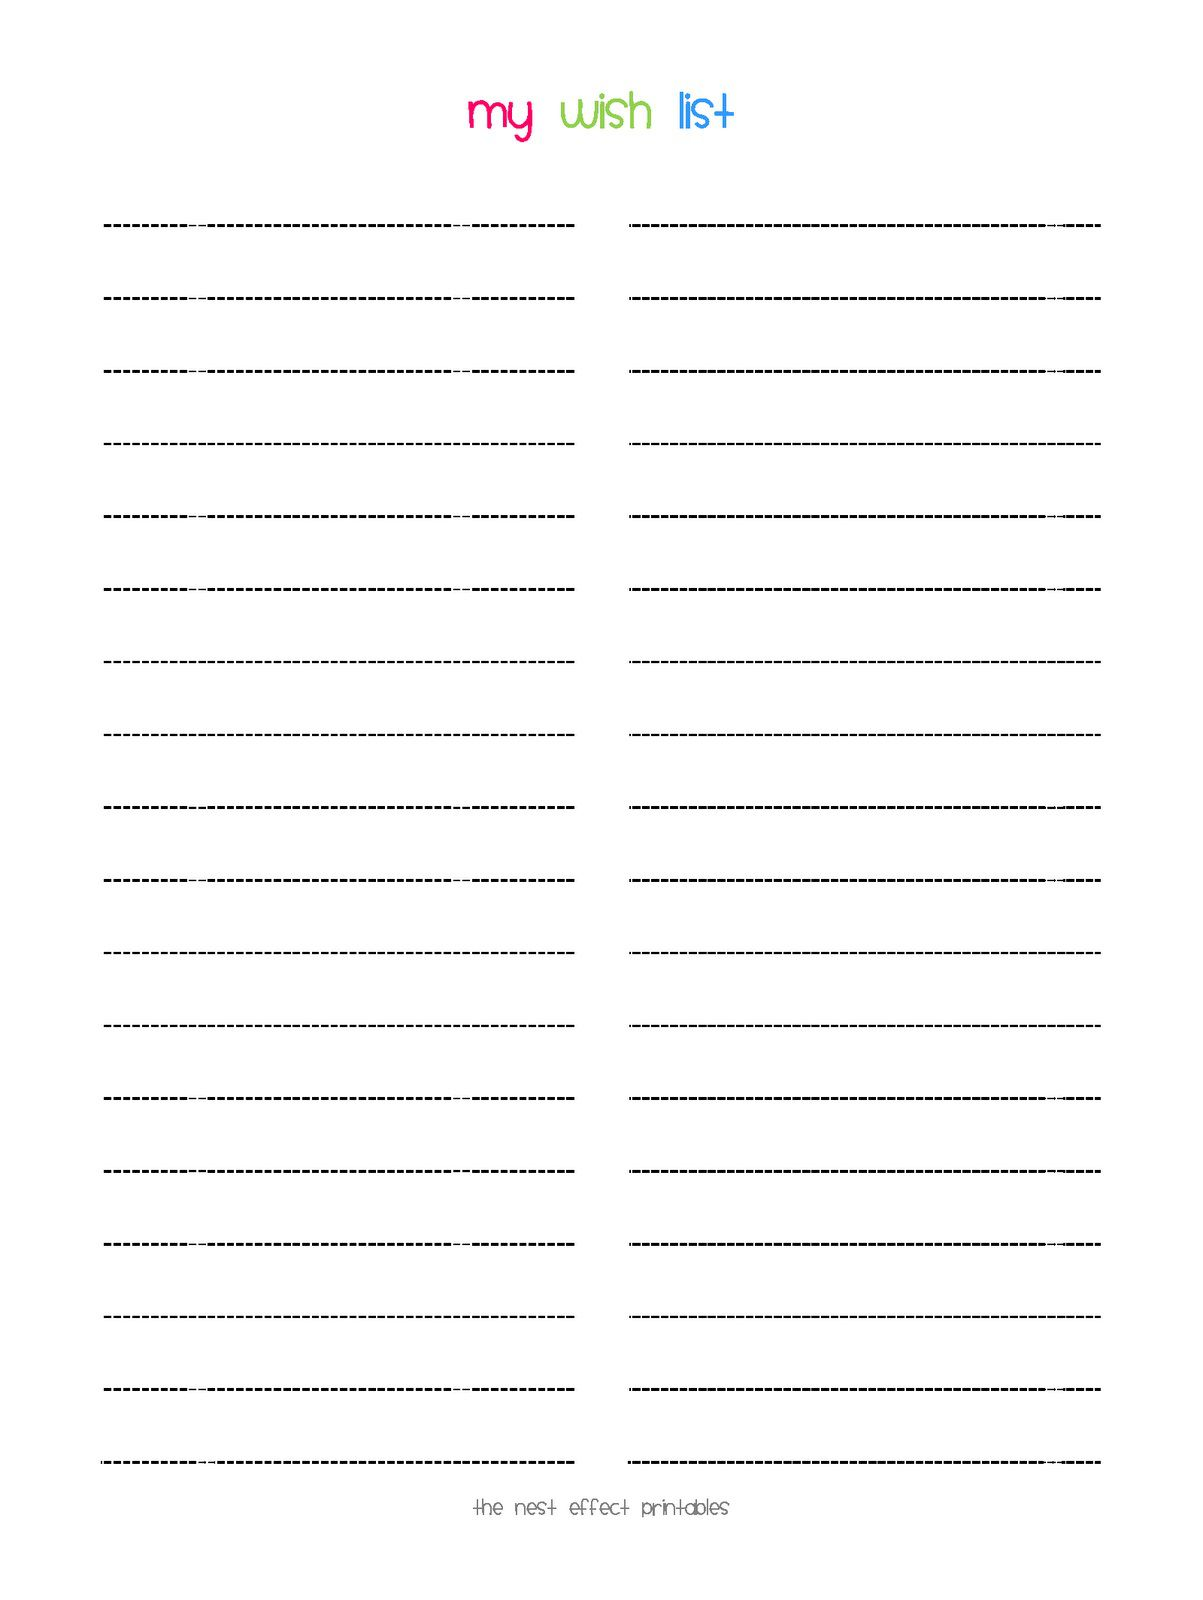 008 Stunning Printable Wish List Template Idea  Cute Christma Free HolidayFull